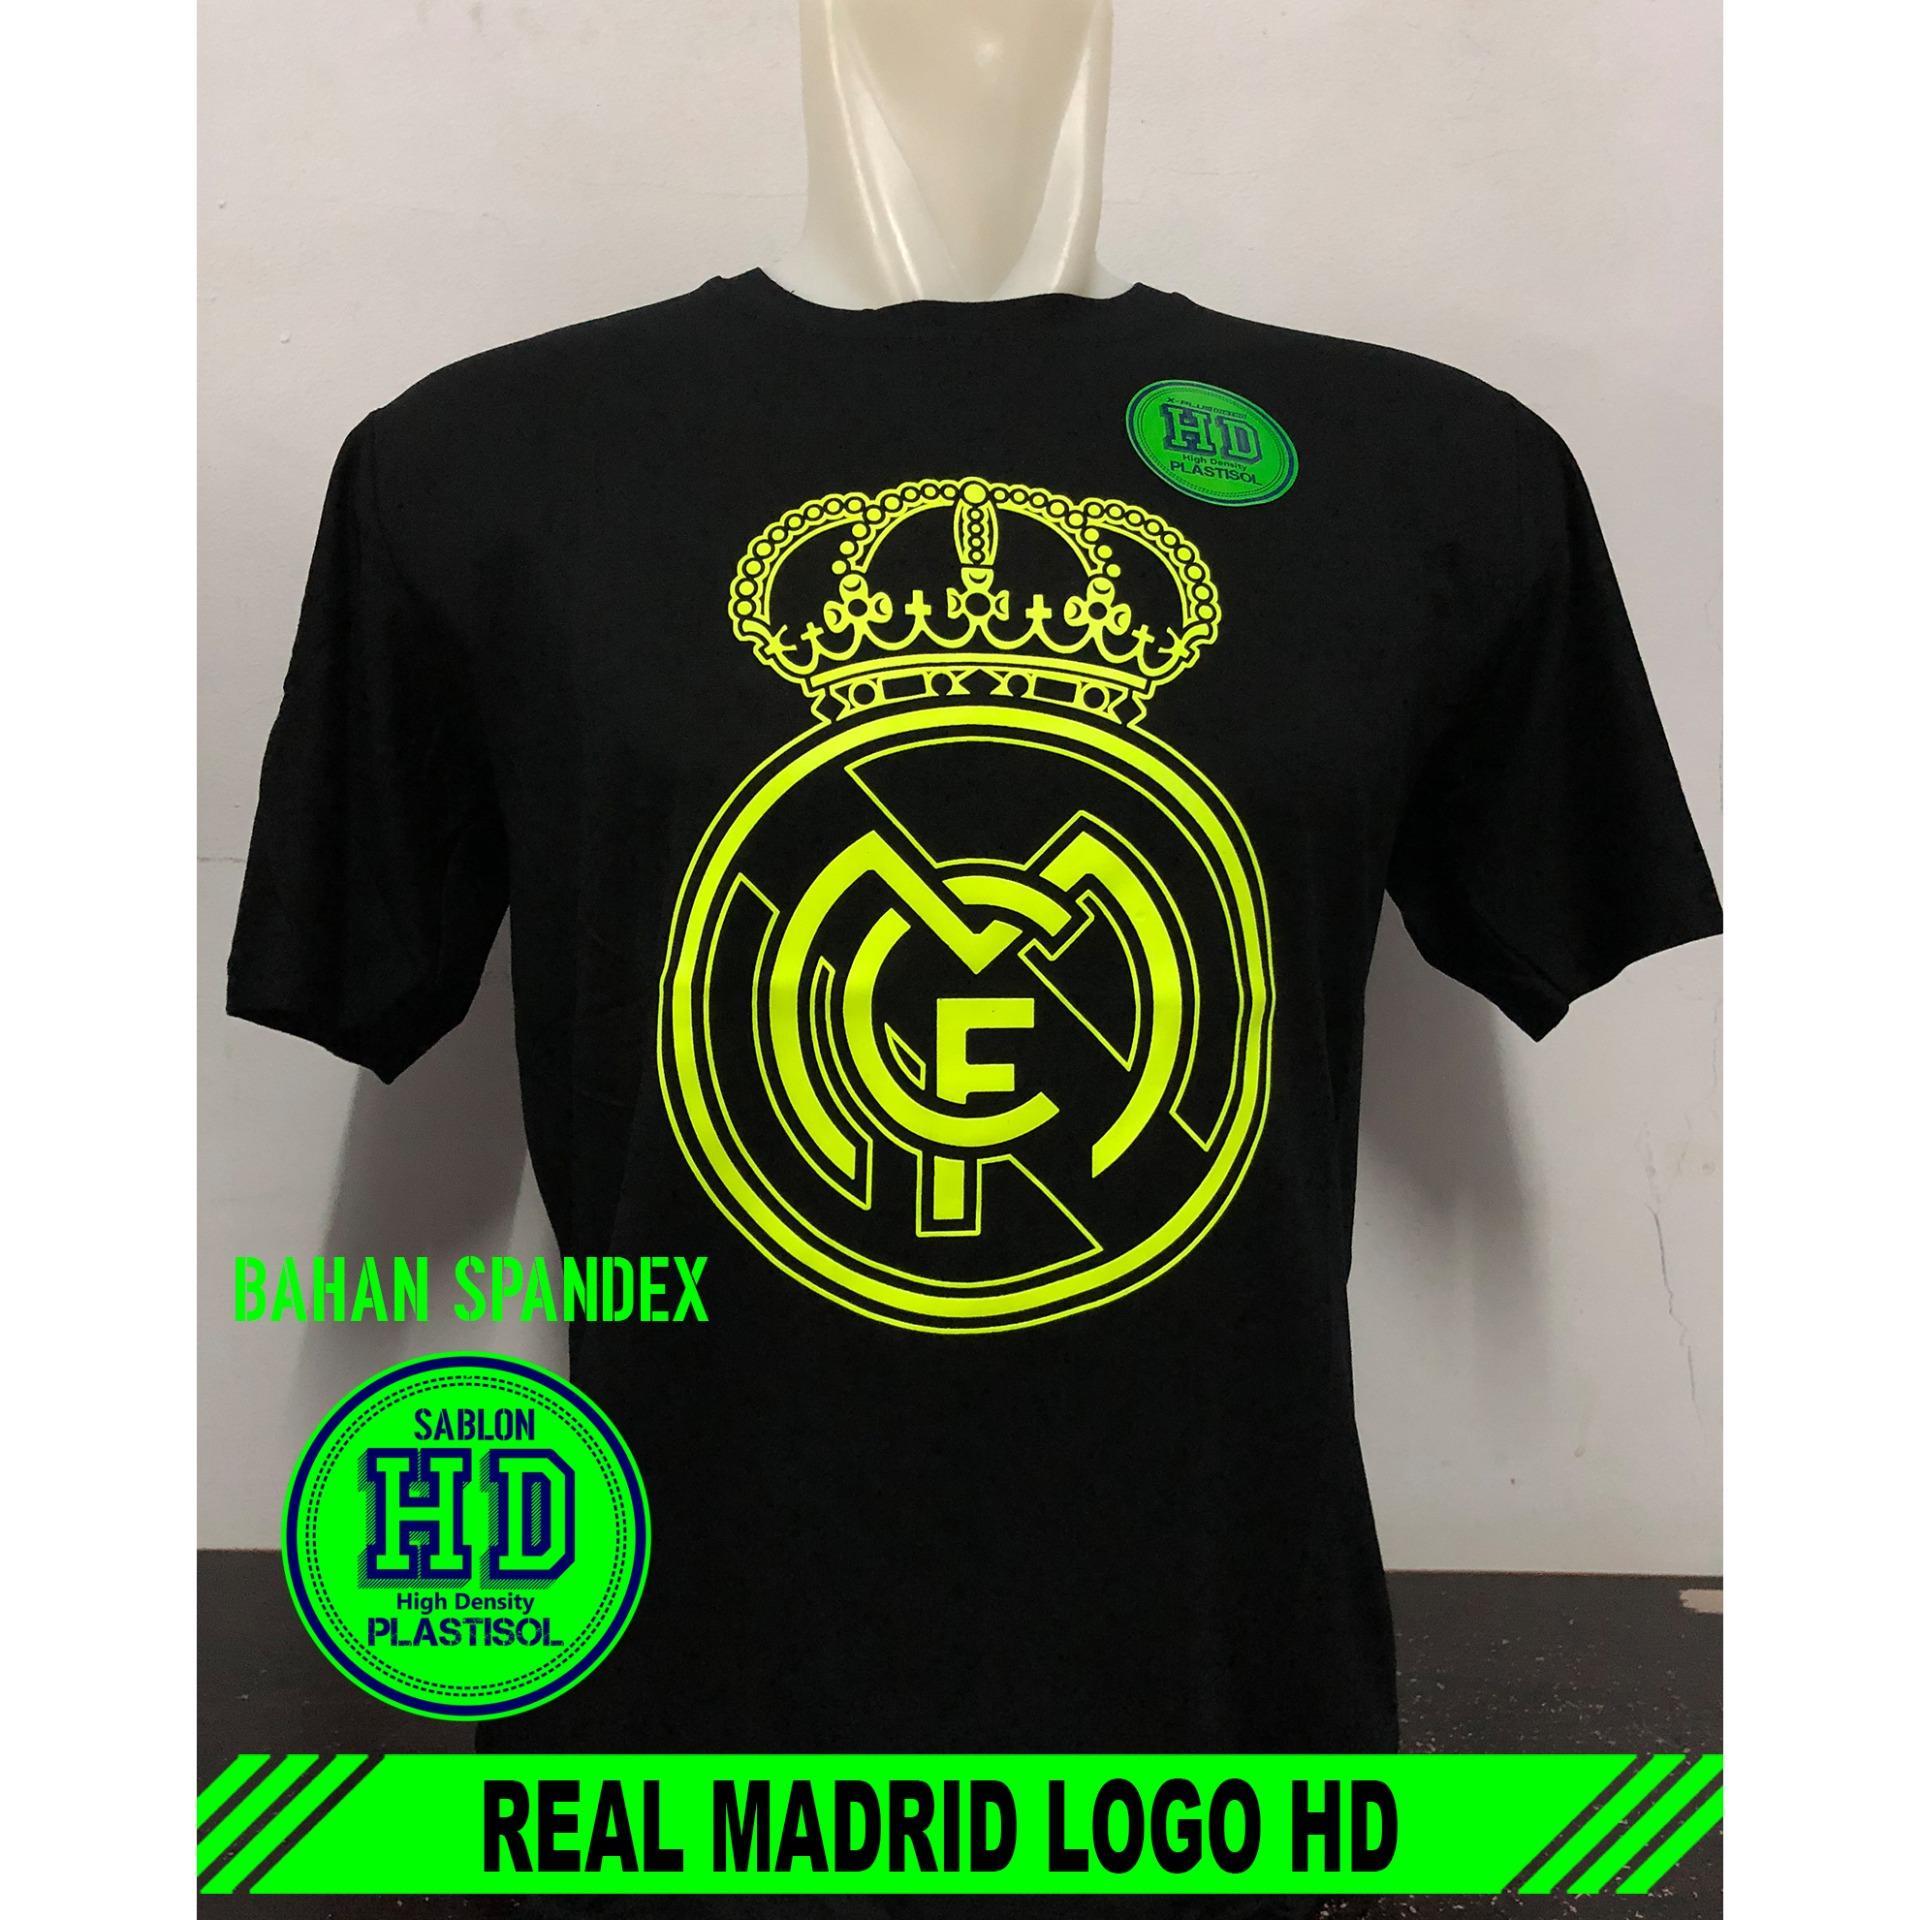 Black Distro - Kaos T-Shirt Distro / kaos Pria / Tshirt Pria / Distro Pria / Baju Pria Real Madrid Logo HD - Hitam